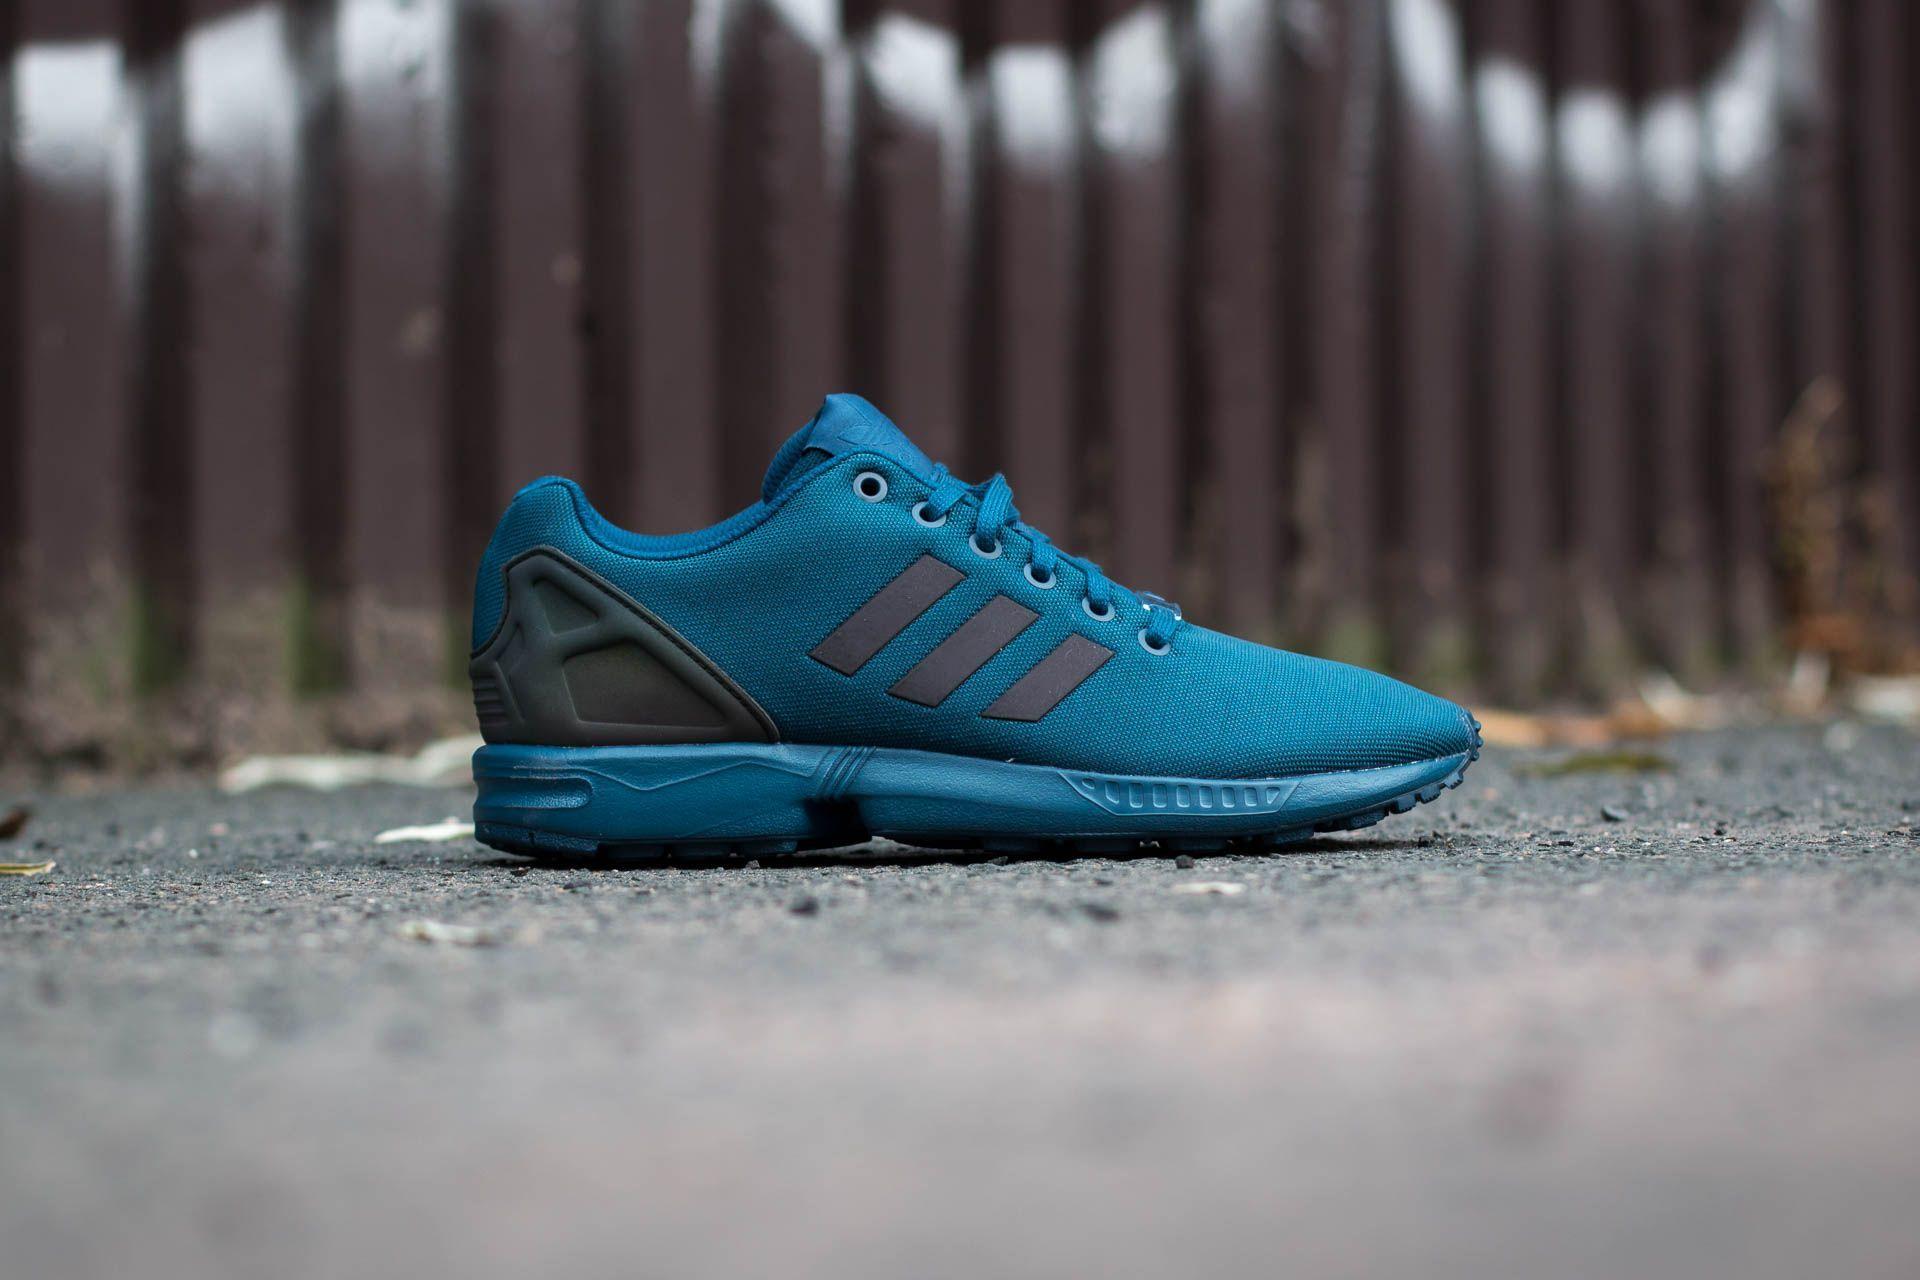 adidas zx flusso adidas nmd scarpe scarpe sneakerhead stile